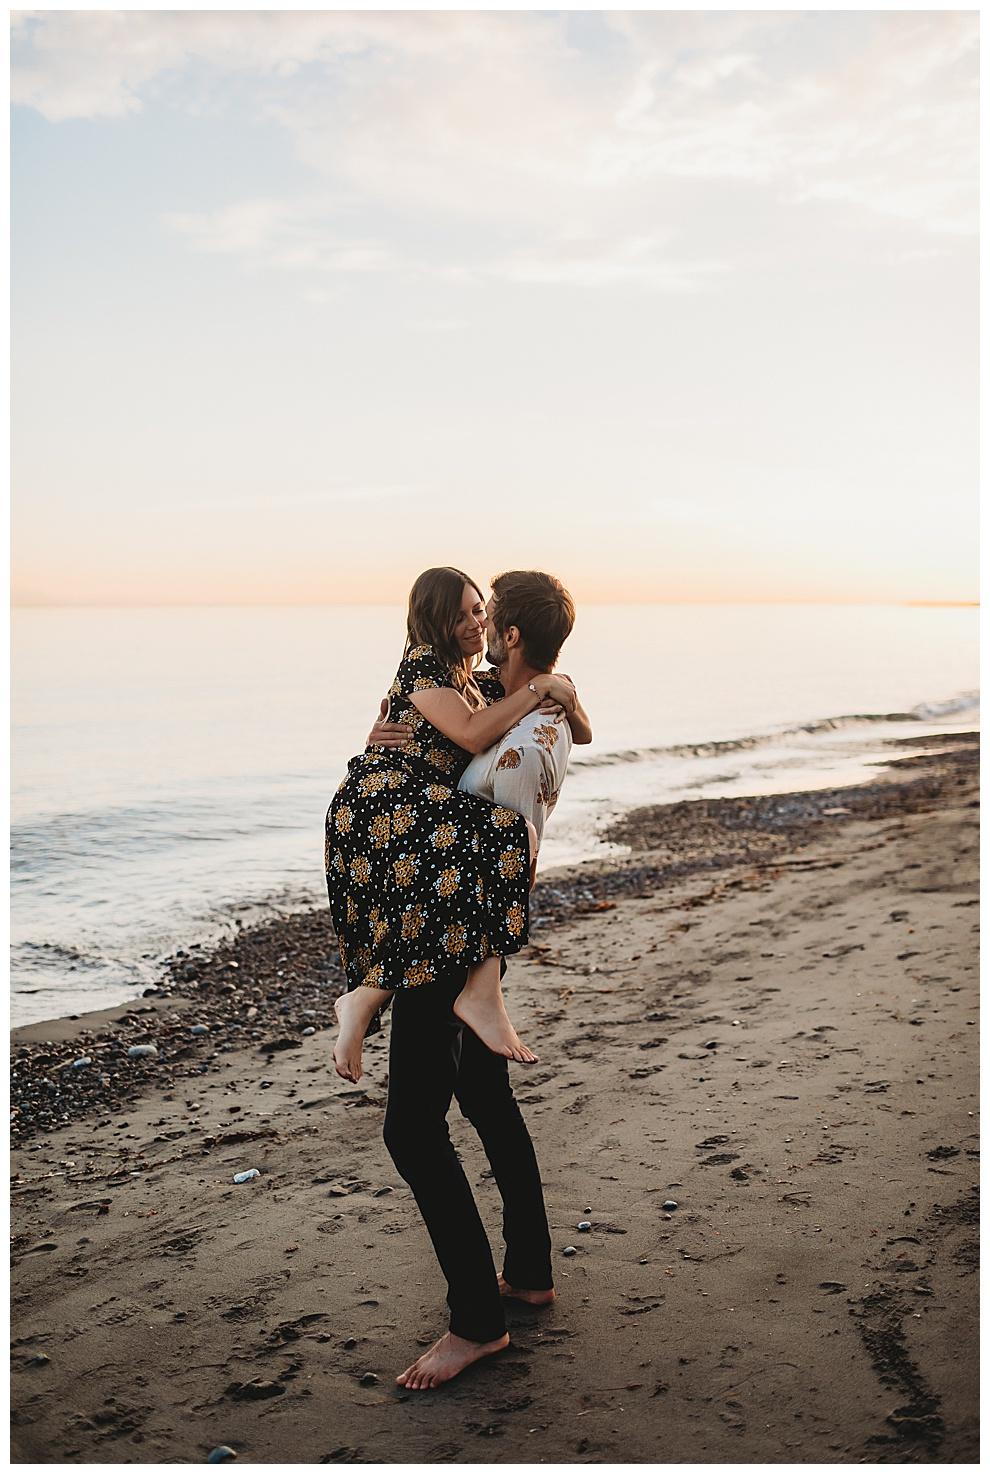 man picks up his girlfriend on beach